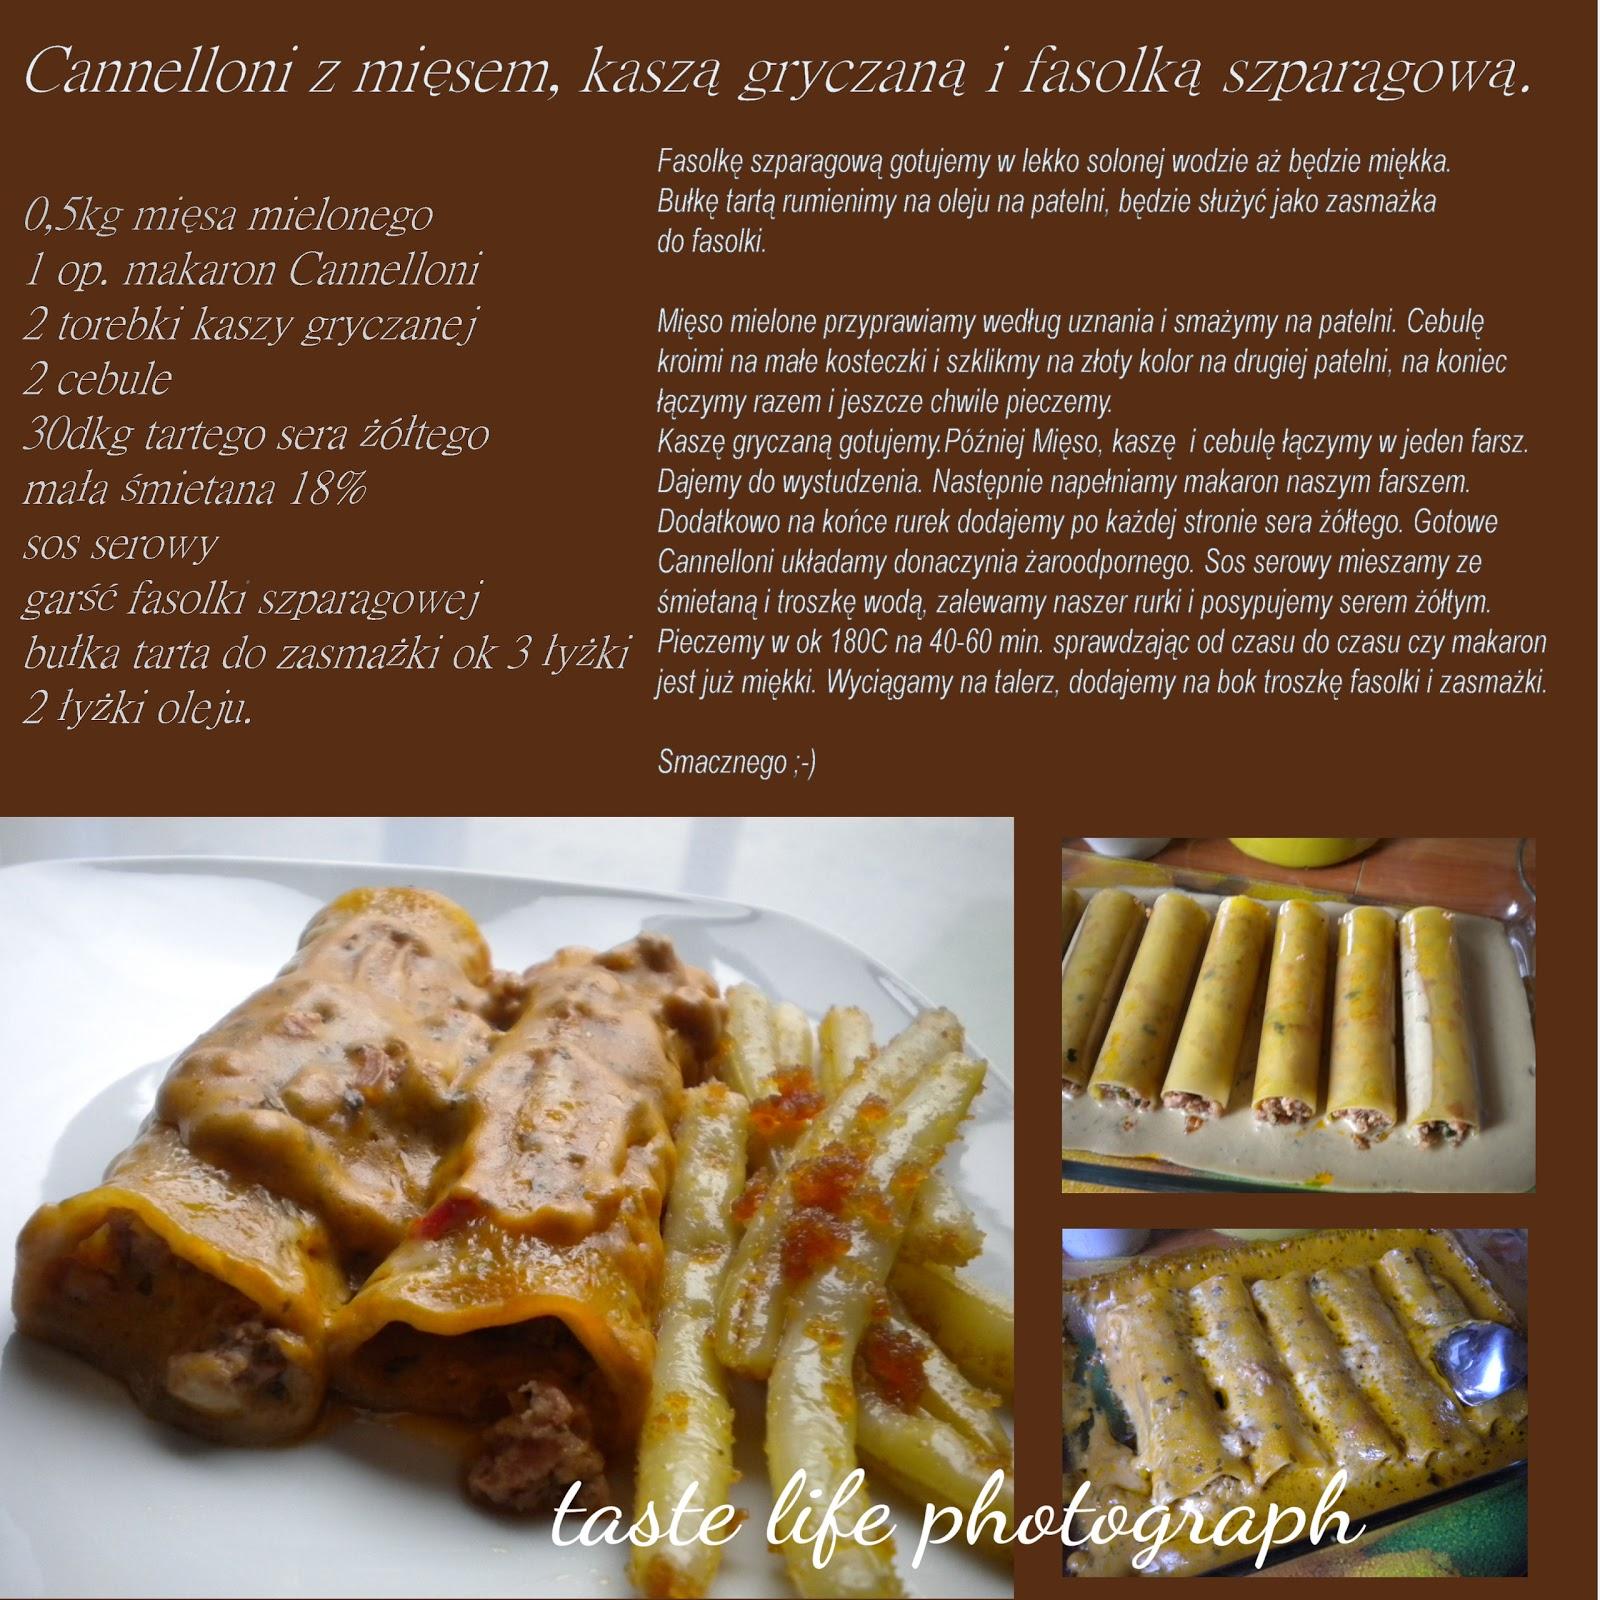 Taste Life Photograph Cannelloni Z Miesem Kasza Gryczana I